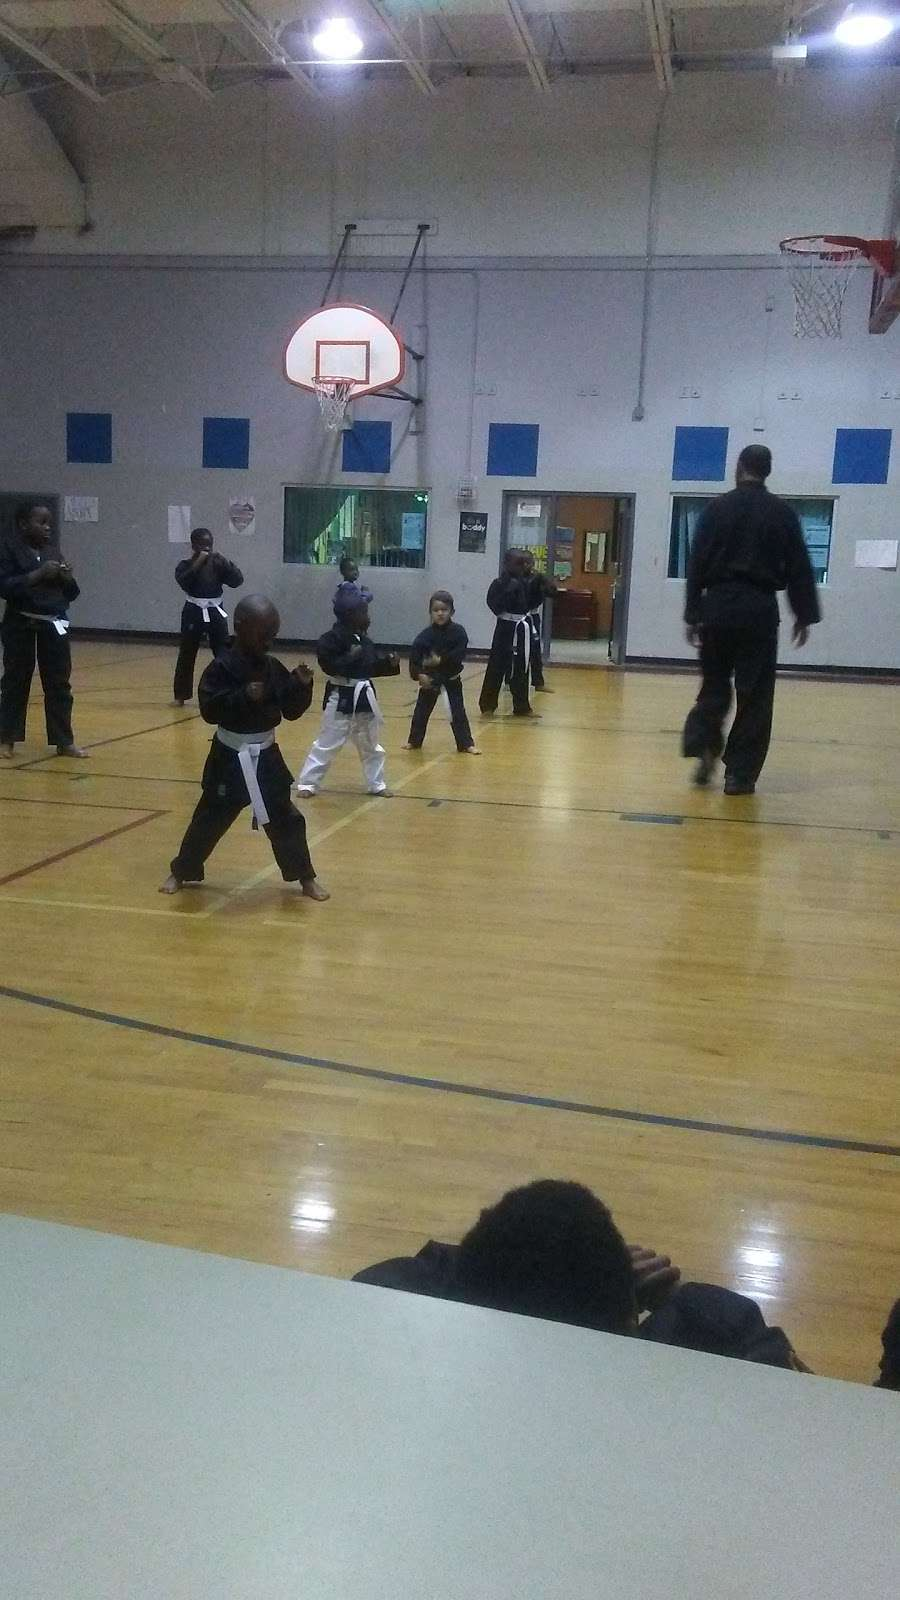 Washington Park Community Center - gym  | Photo 1 of 1 | Address: 5199 Pembroke Rd, Hollywood, FL 33021, USA | Phone: (954) 967-4240